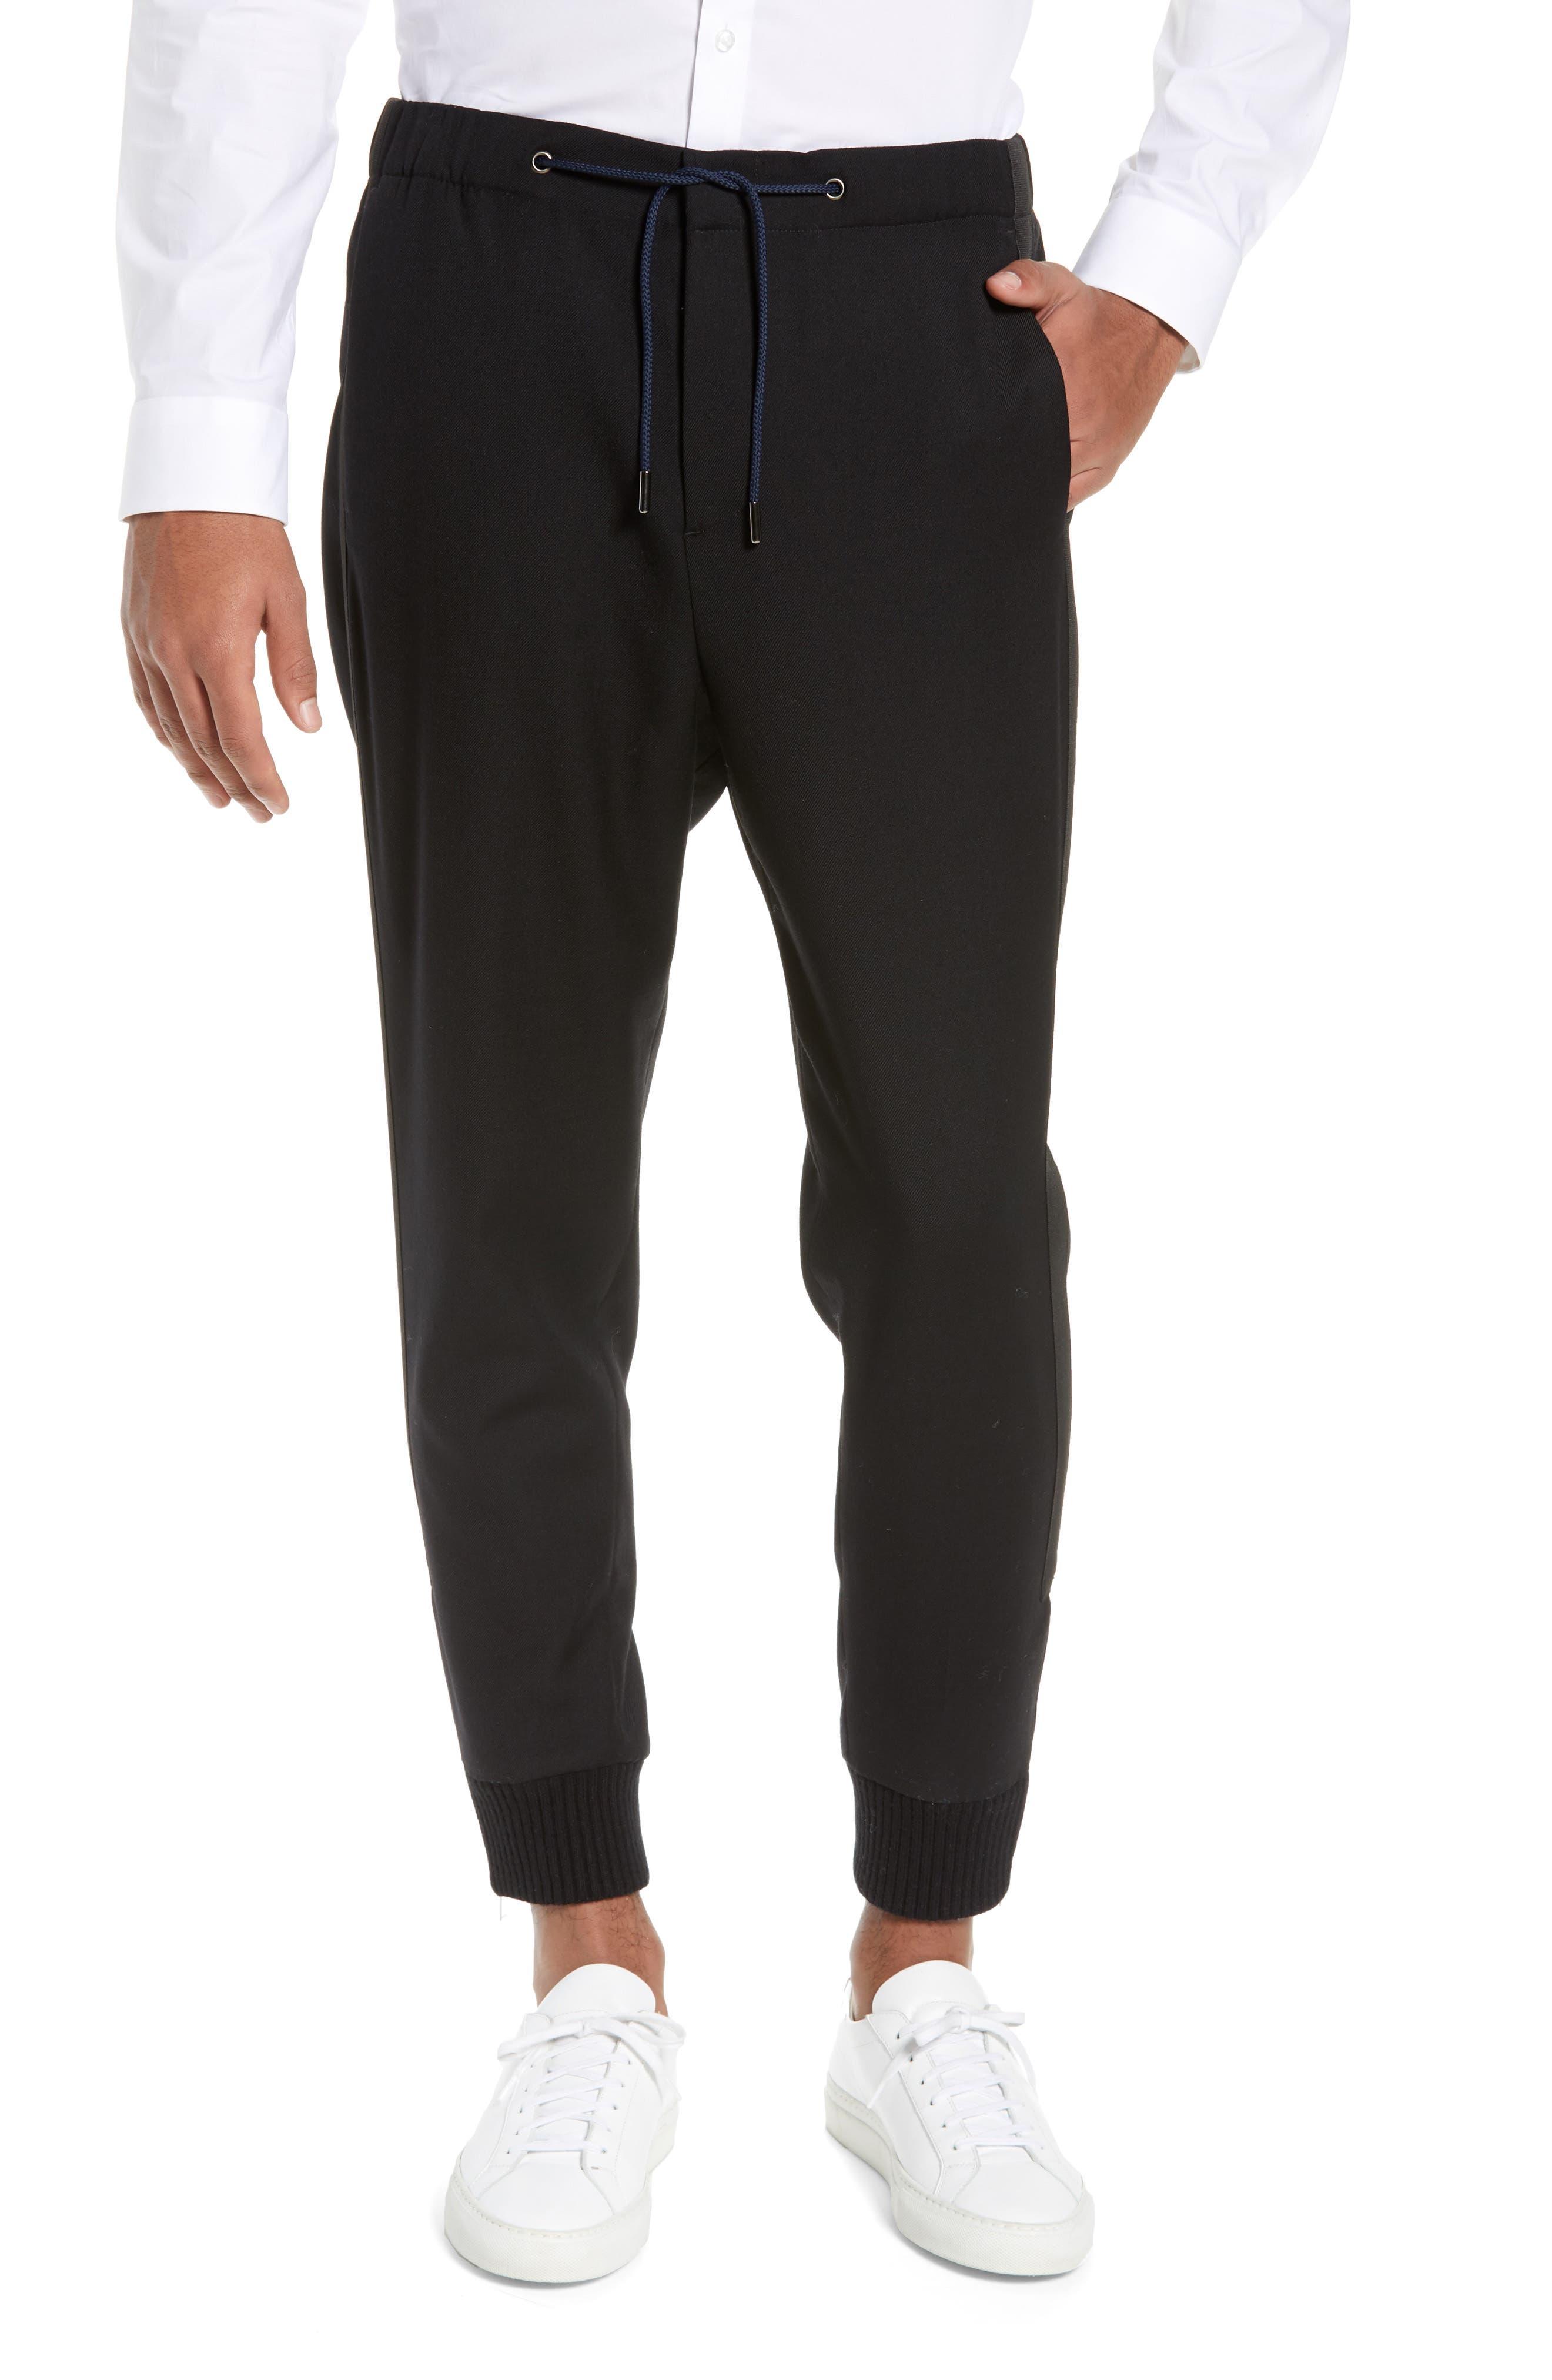 THE KOOPLES Straight Leg Woven Jogger Pants, Main, color, BLACK